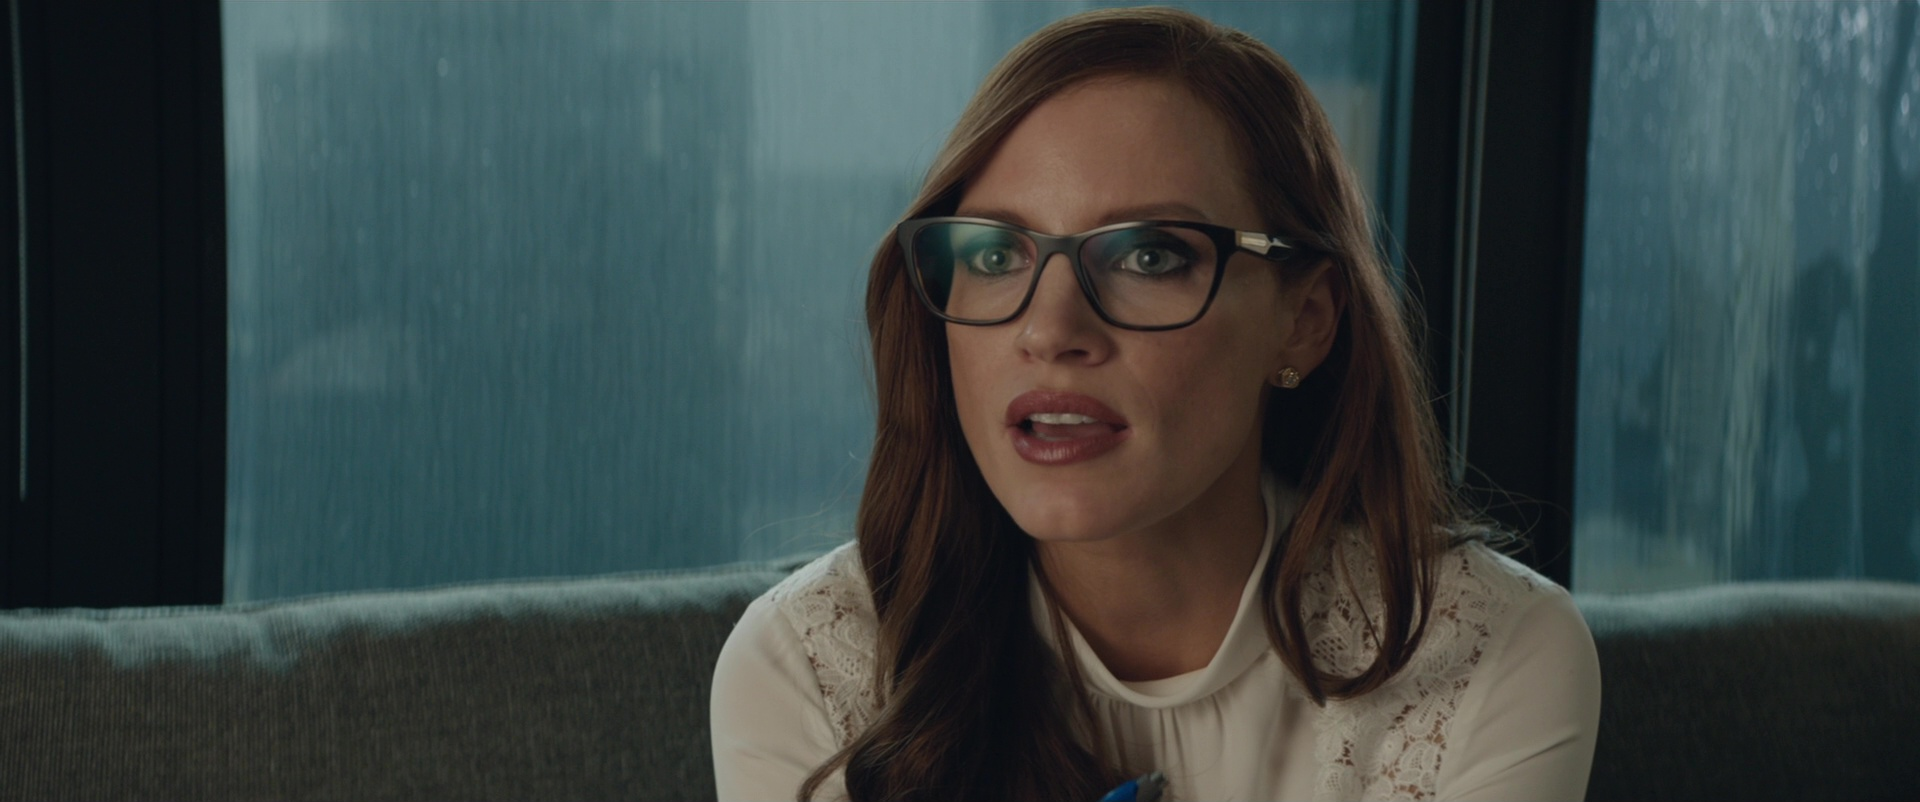 Prada Square Plastic Eyeglasses Worn By Jessica Chastain